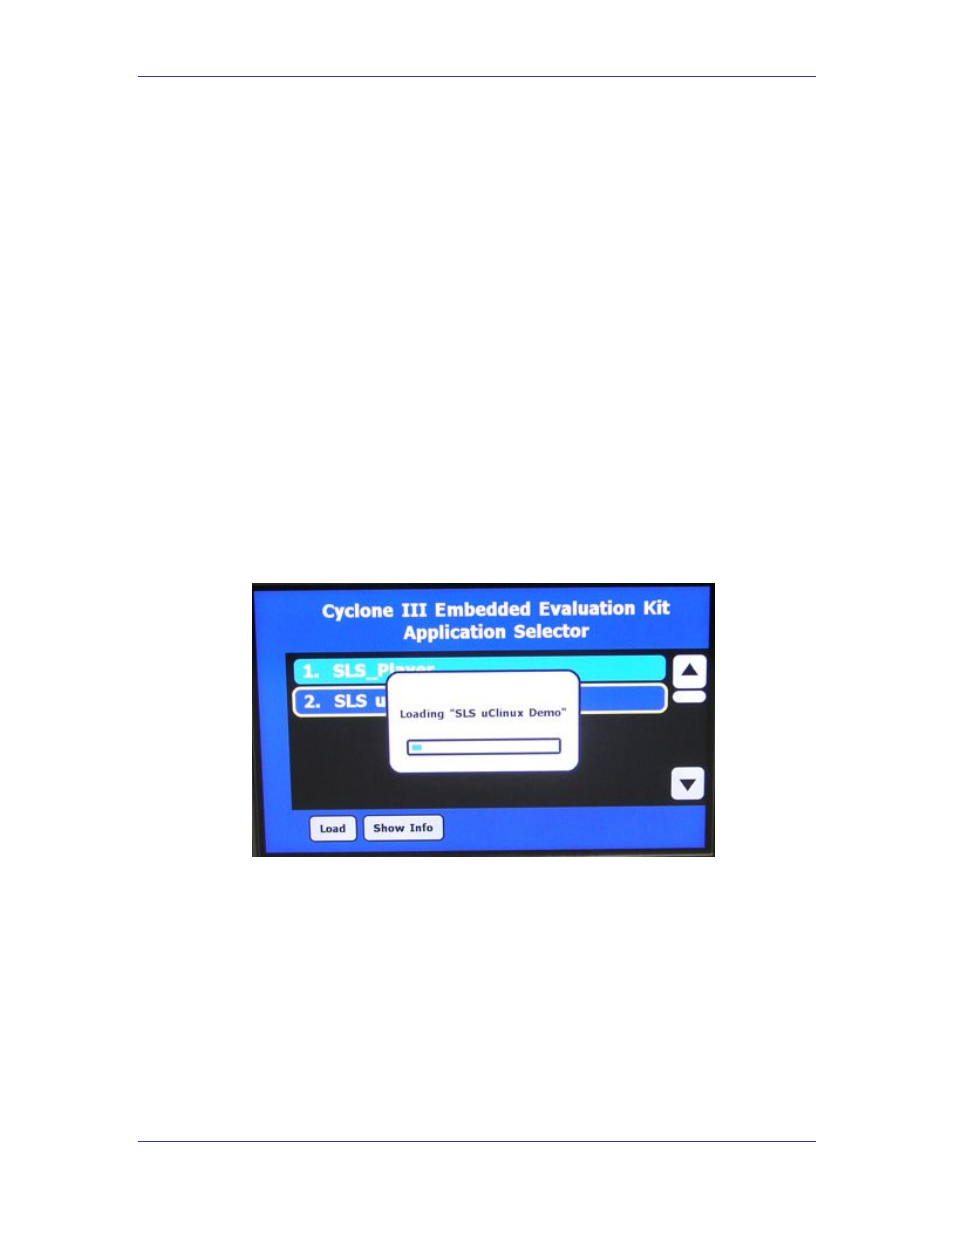 Sls uclinux demo | SLS Audio NEEK Board Support Package uClinux User